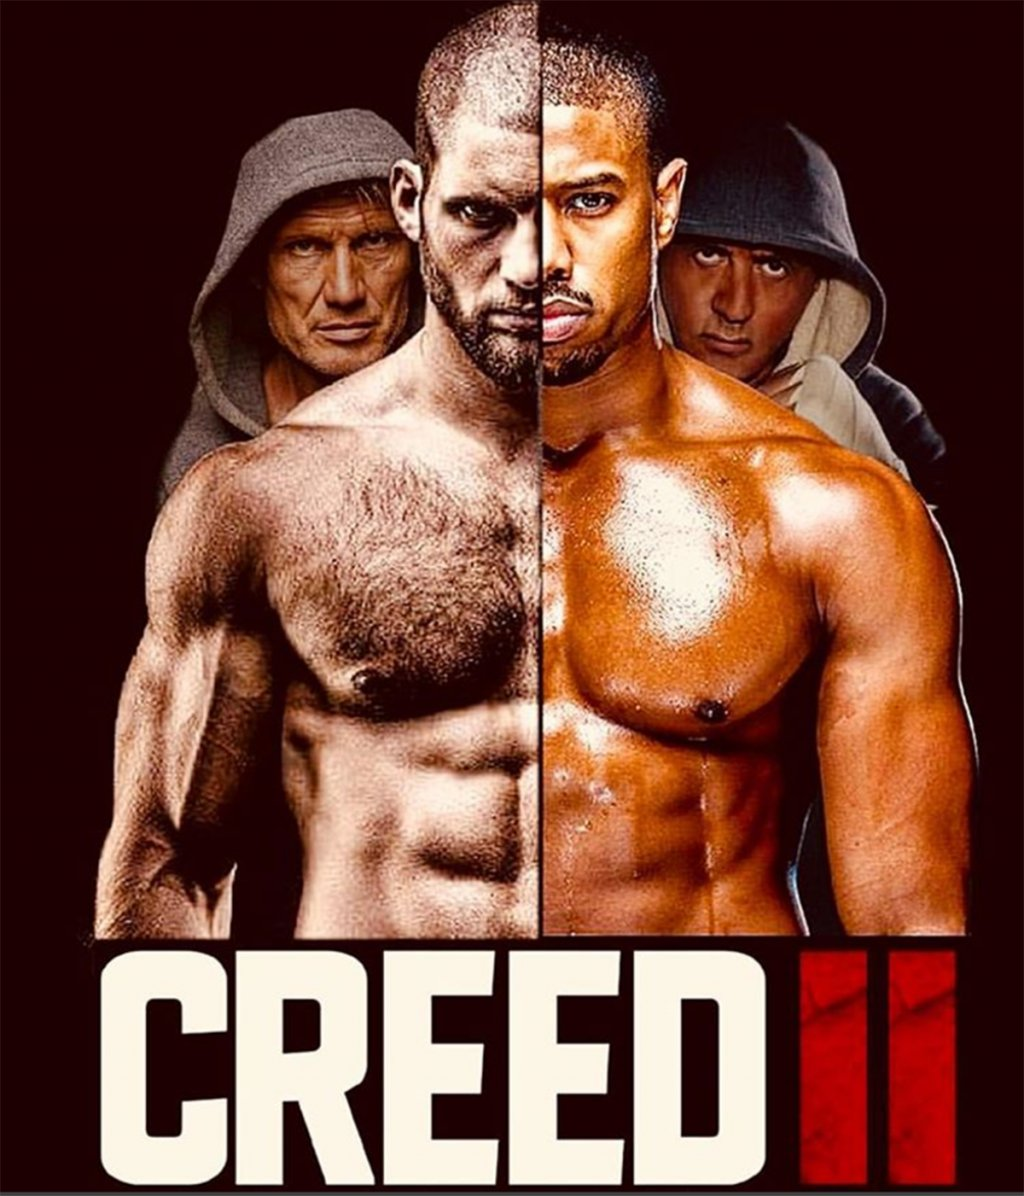 Arena Maipú's photo on Creed II